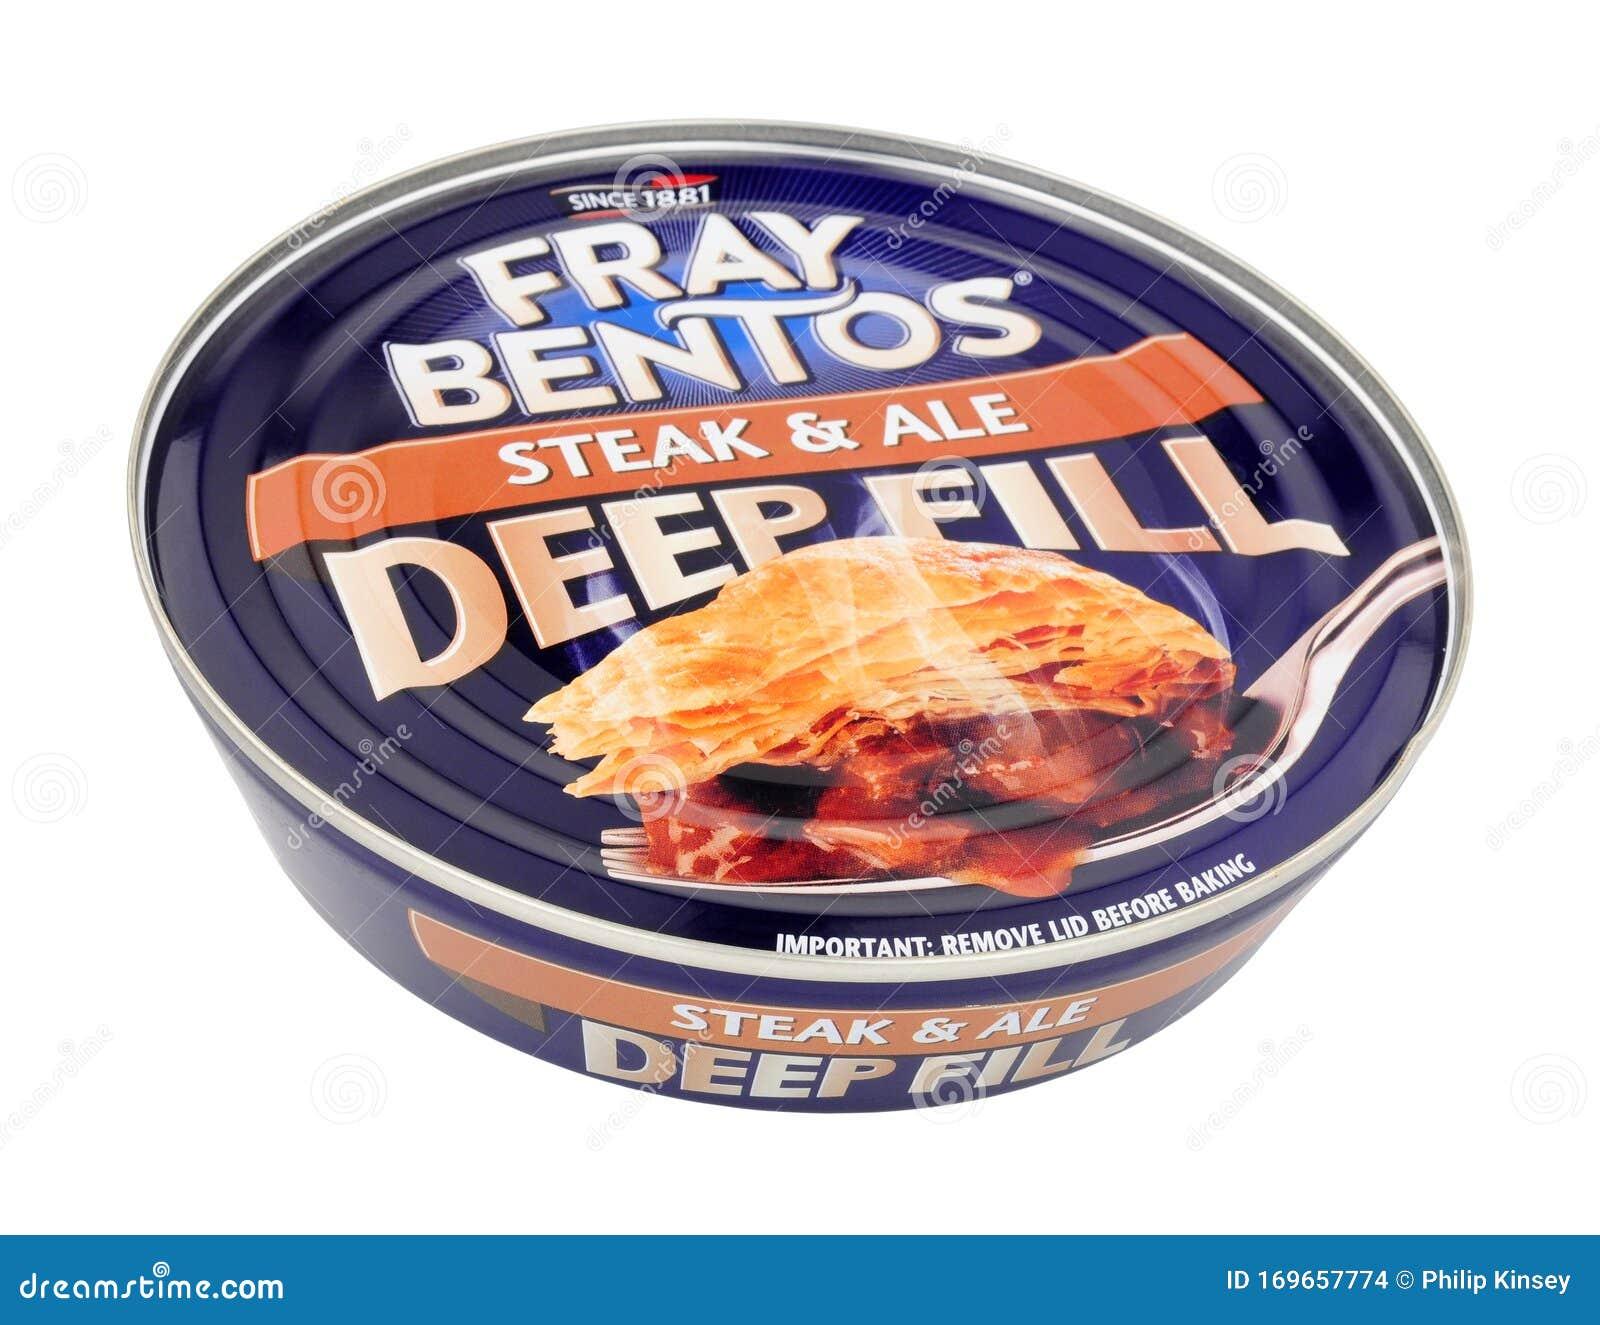 Fray Bentos Steak And Ale Pie Editorial Stock Image ...